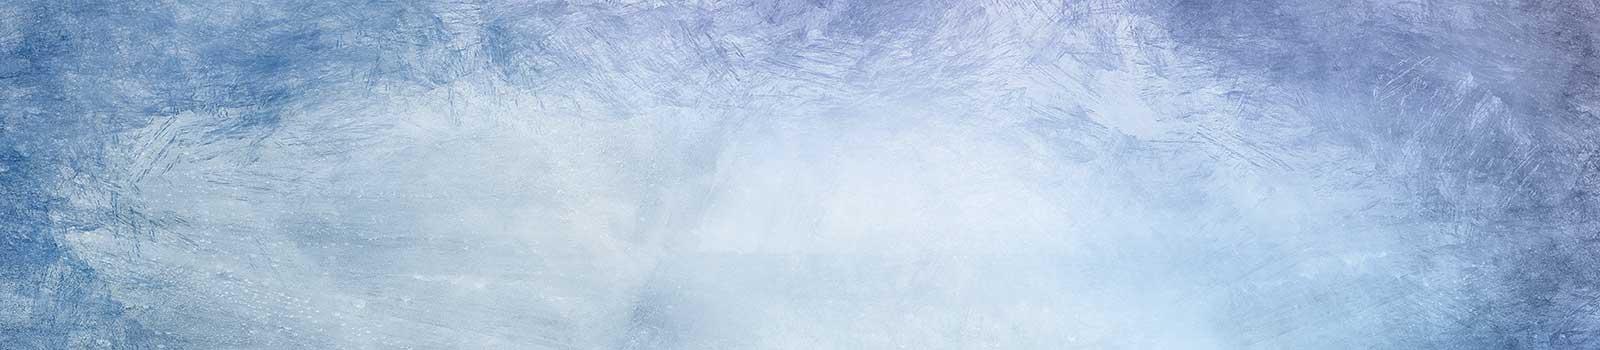 ARCTIC GRIP WET ICE TECHNOLOGY